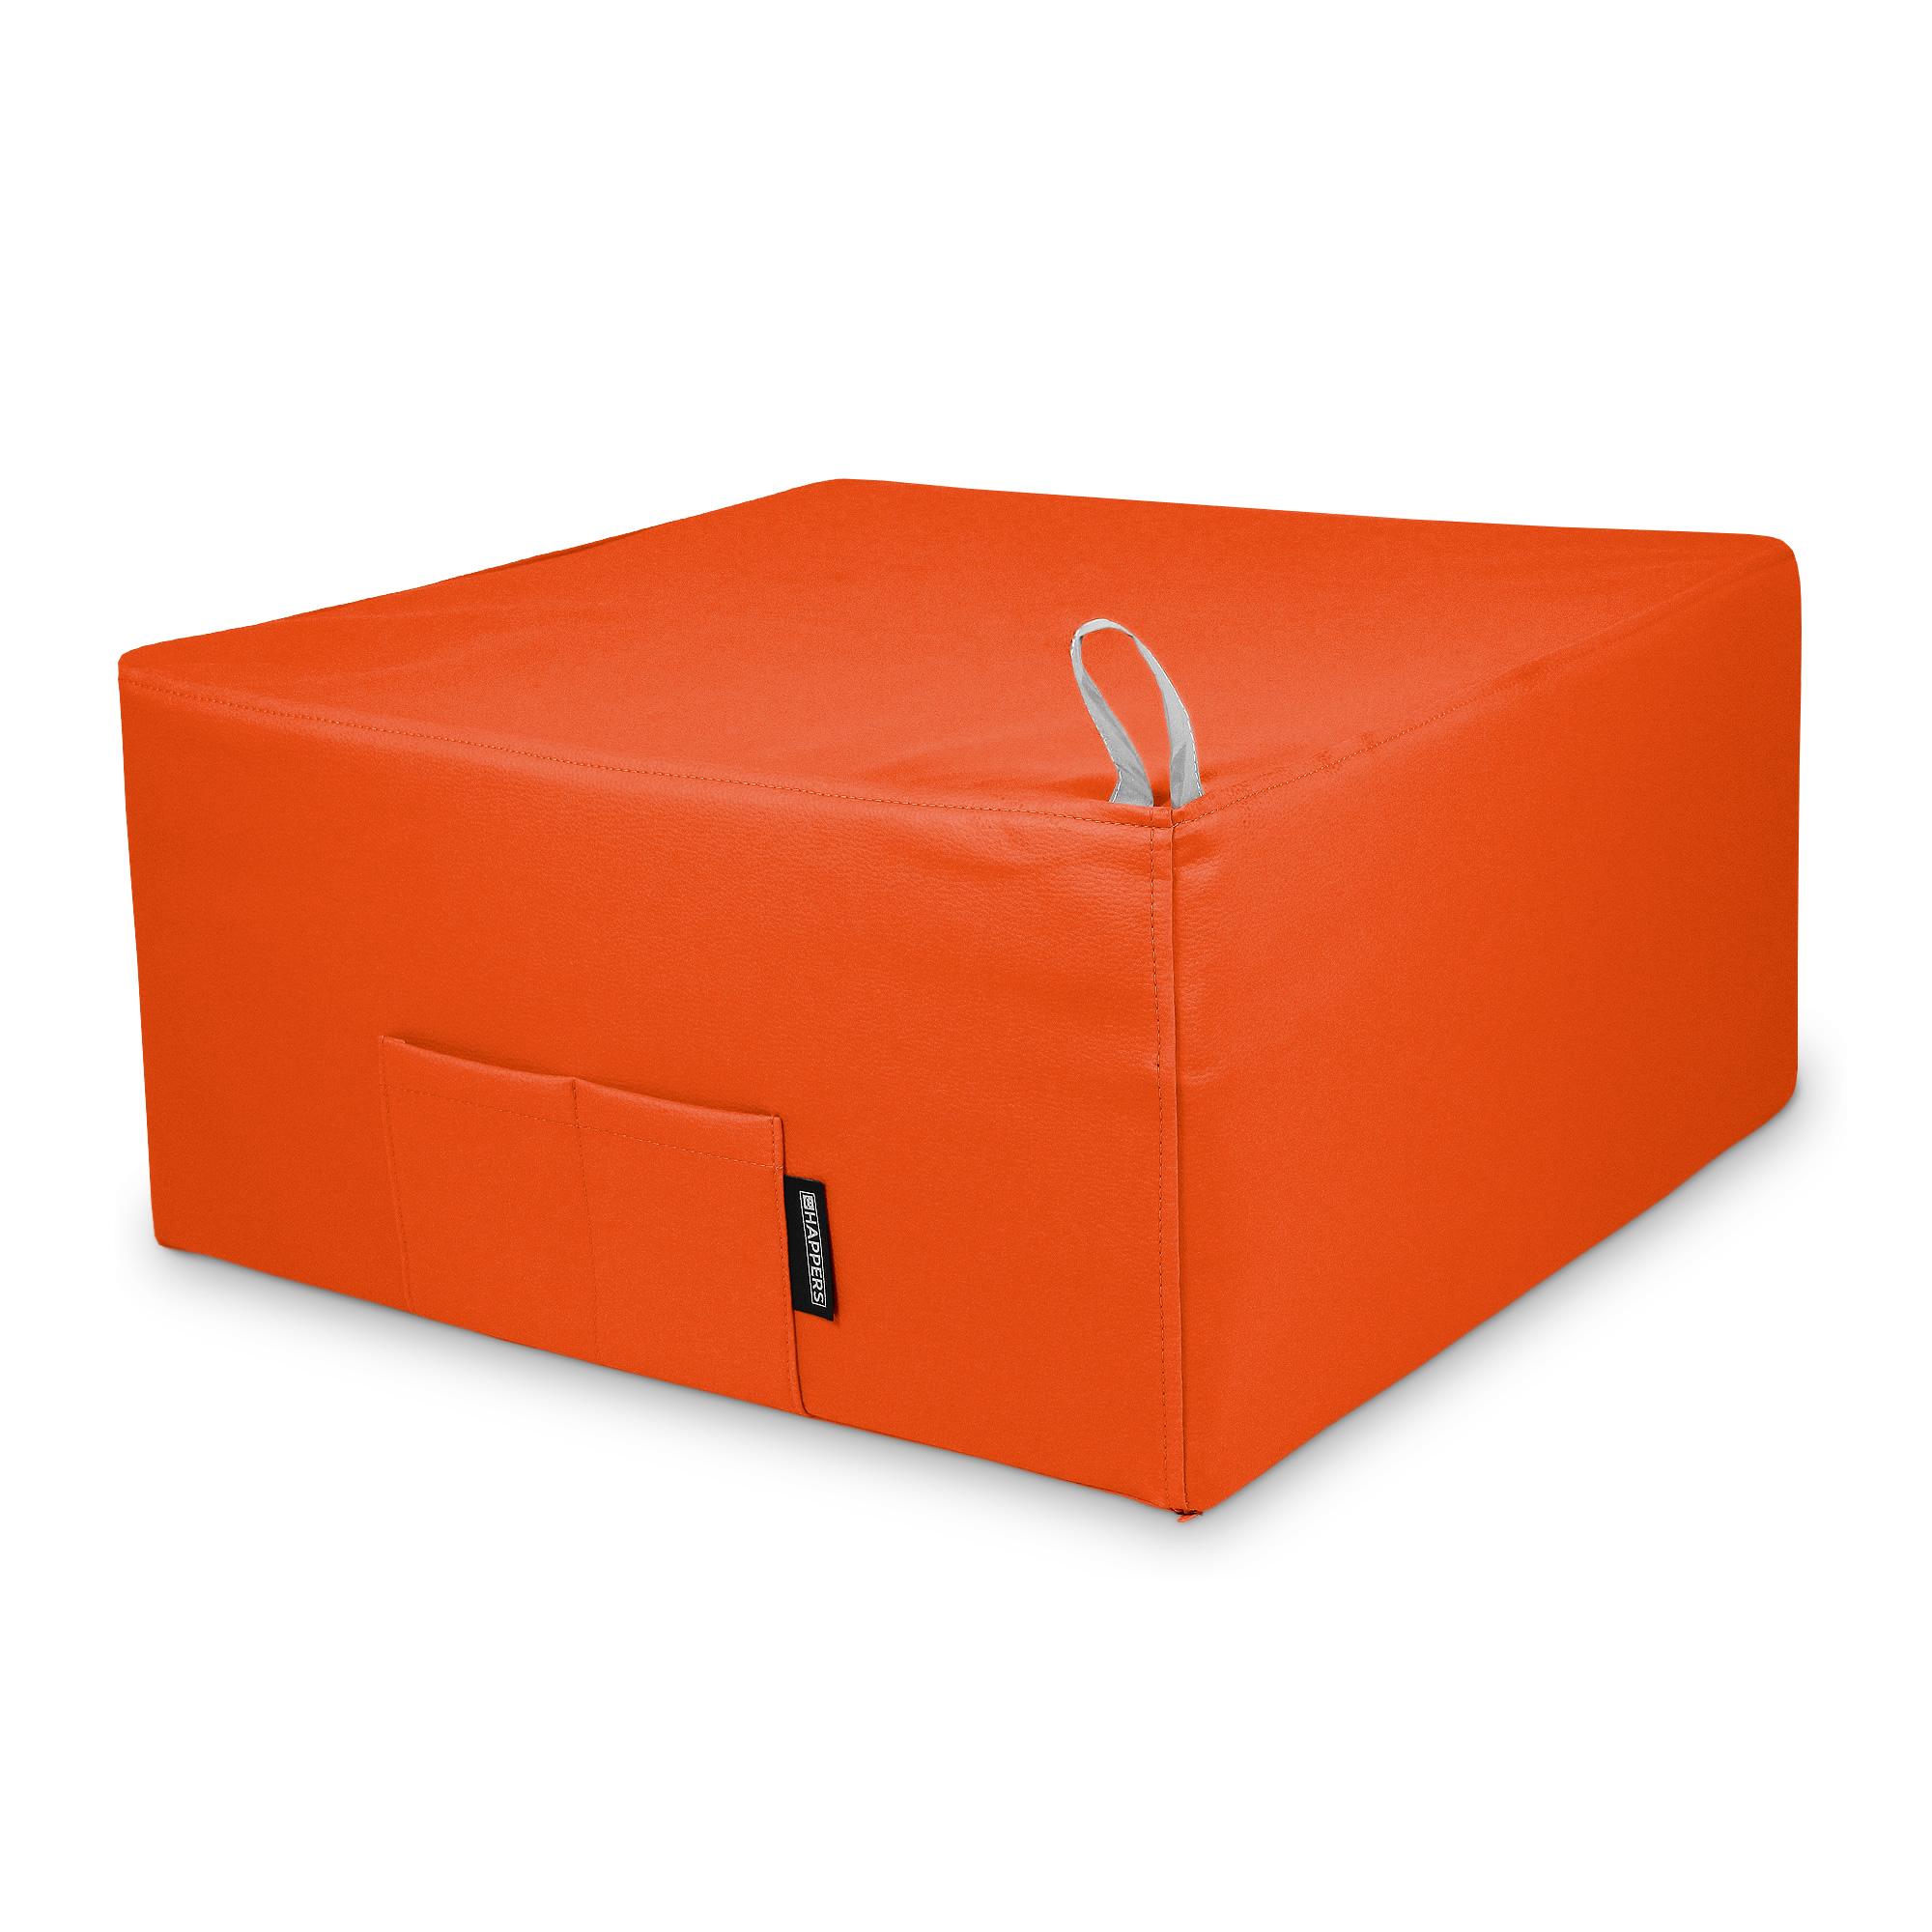 Puff Cama Individual para una persona Polipiel Indoor Naranja en puffdepera.com